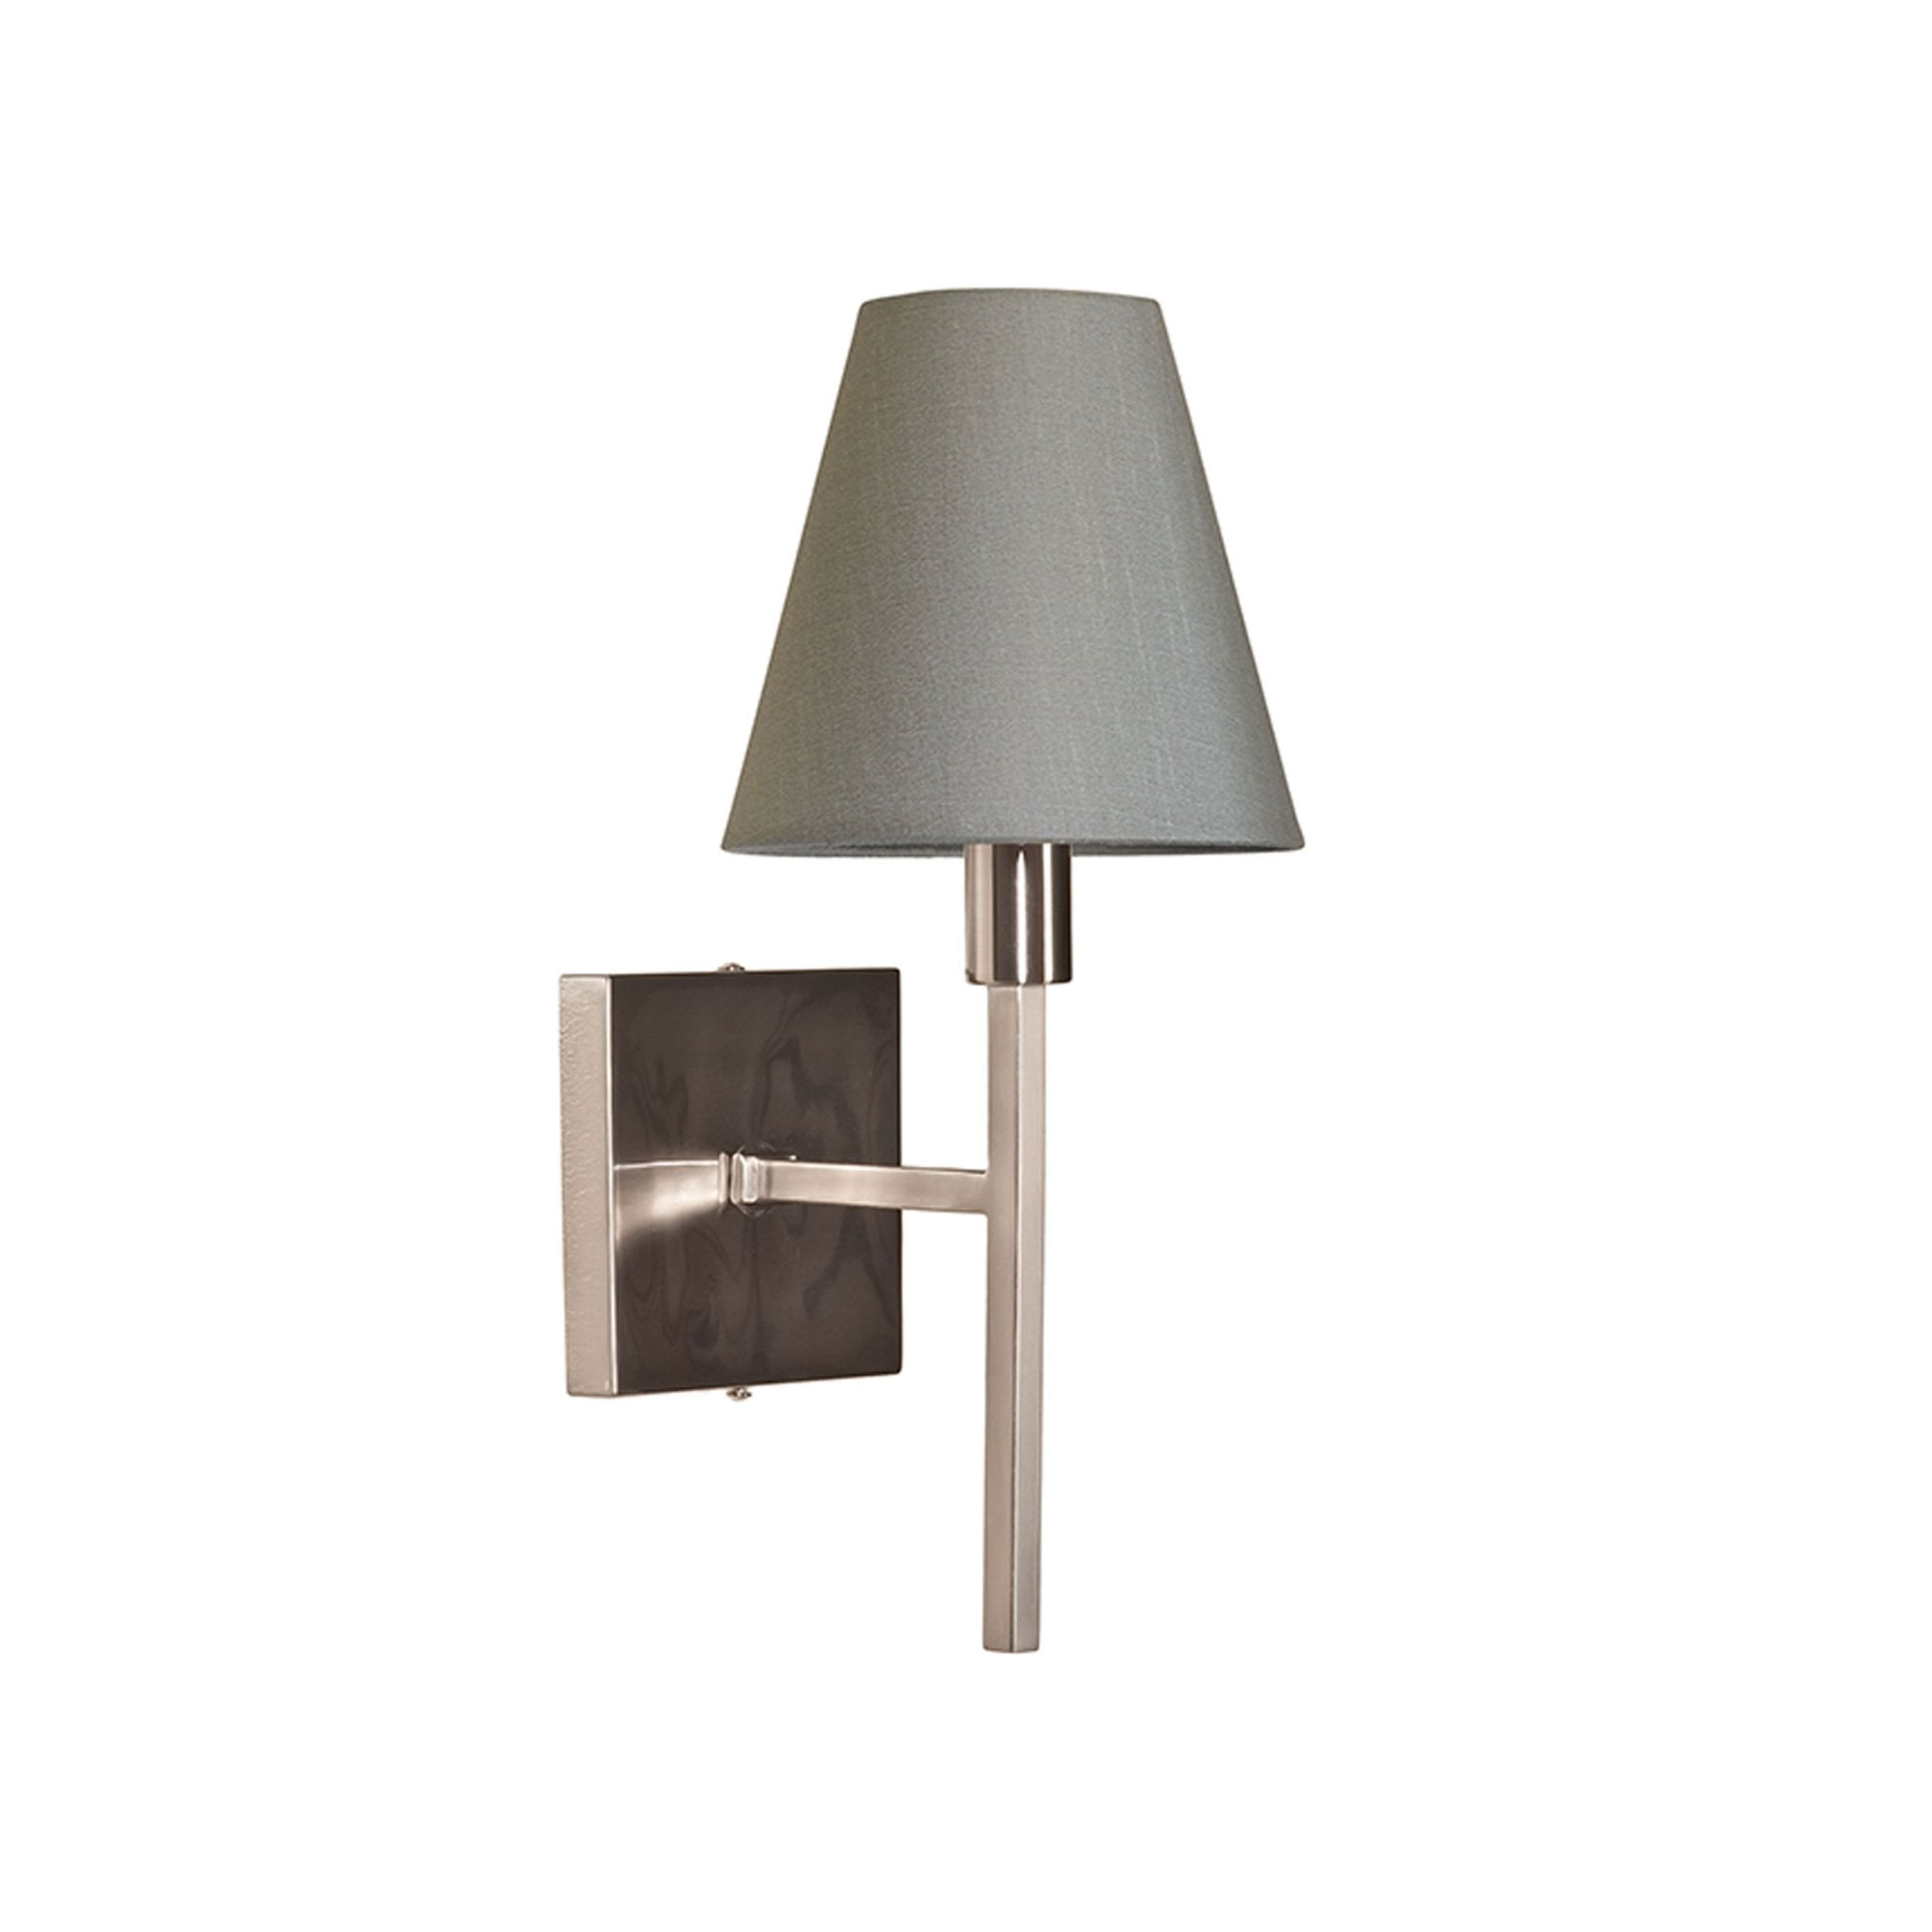 Elstead Lighting Lucerne Single Wall Light In Brushed Nickel Fitting Style From Dusk Lighting Uk